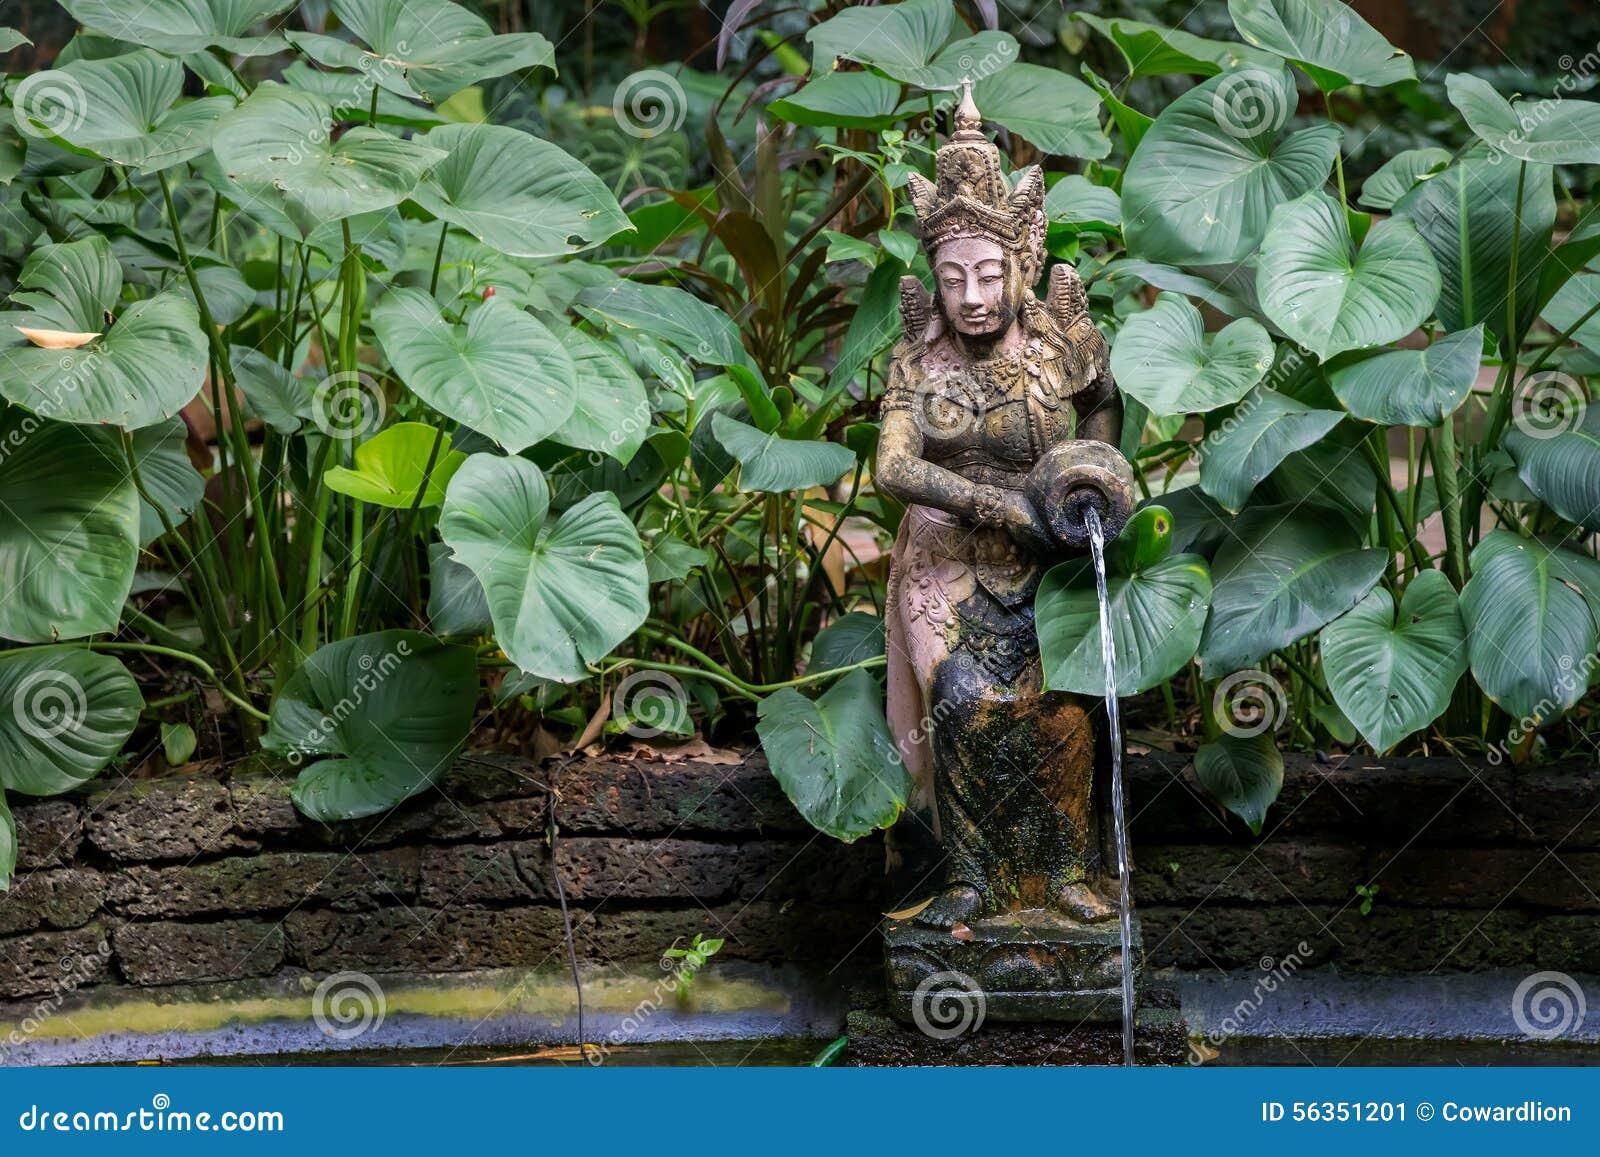 giardino tailandese con una fontana e un piccolo stagno fotografia ... - Piccolo Giardino Con Fontana